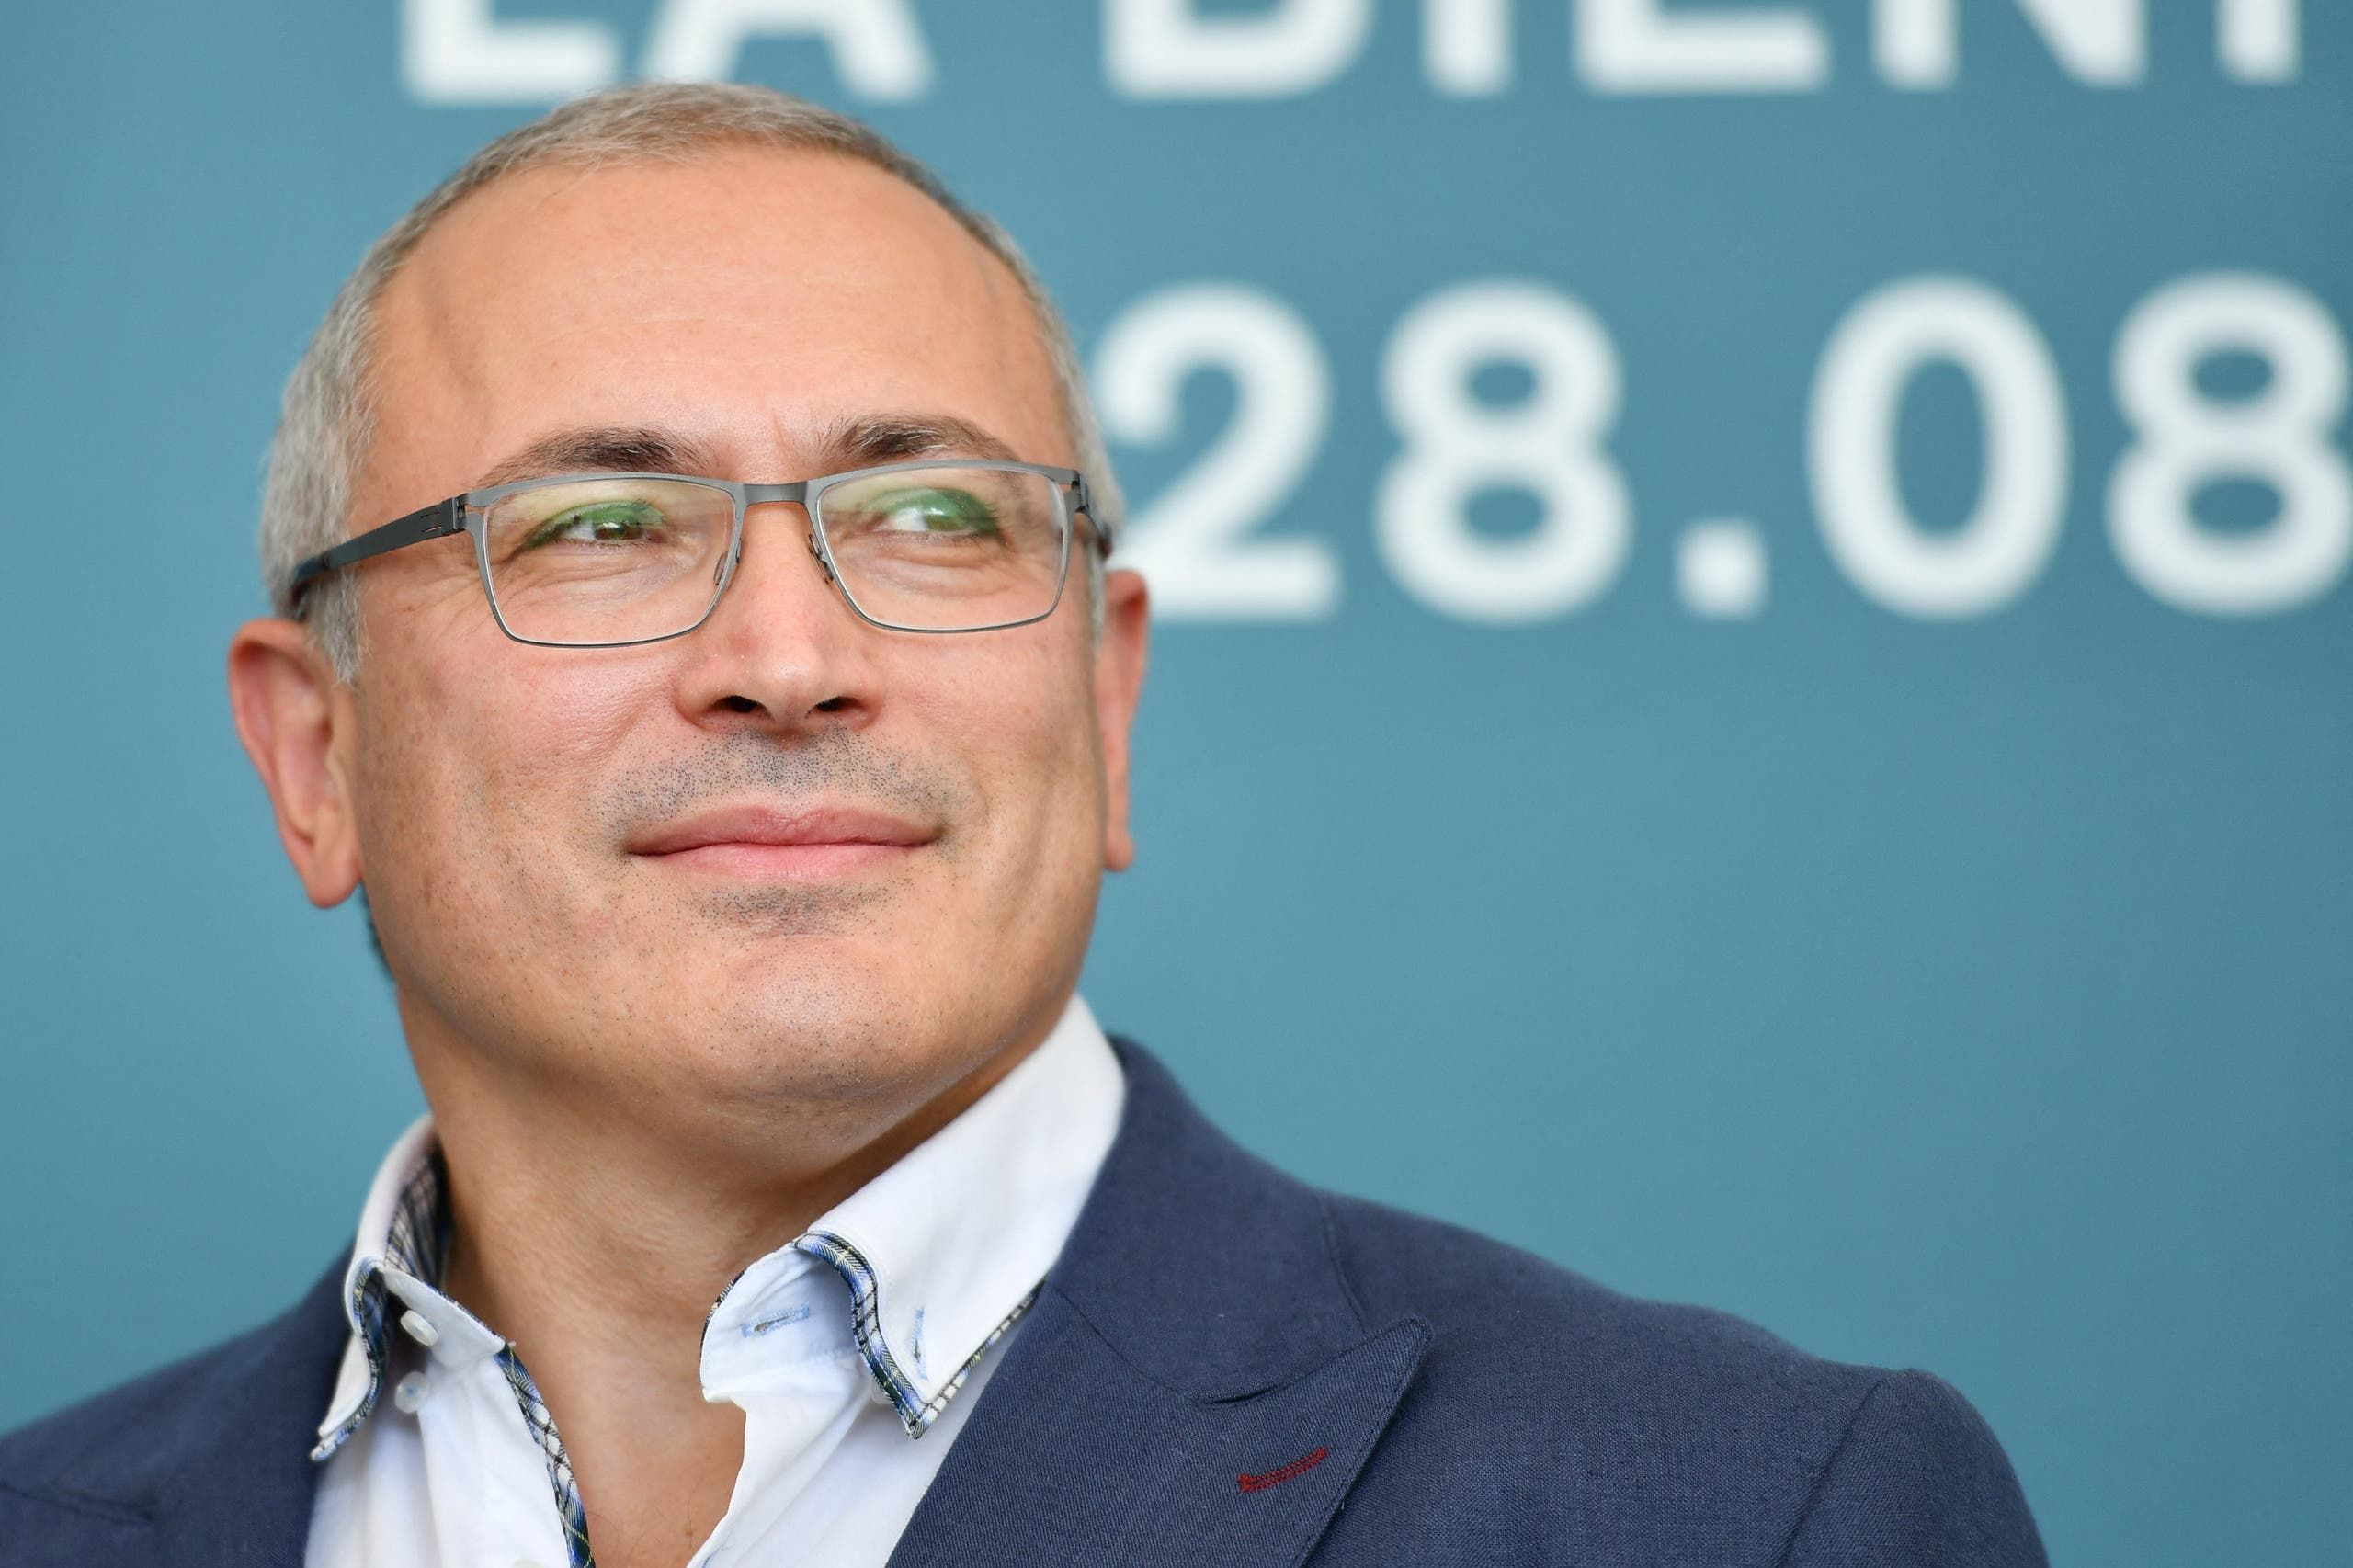 رجل الأعمال ميخائيل خودوركوفسكي